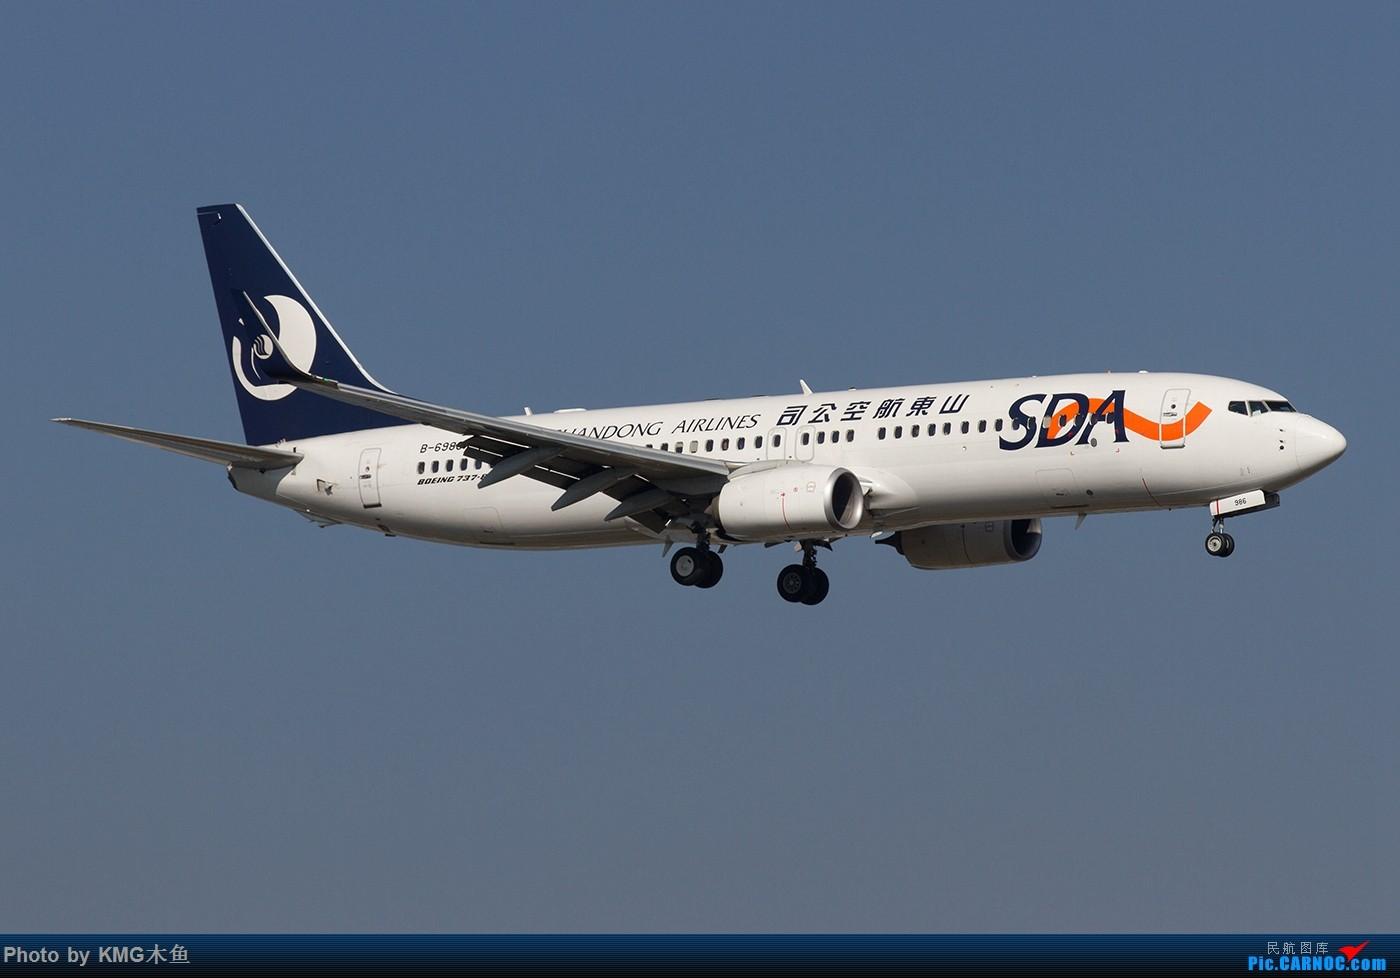 Re:[原创]【昆明飞友会-KMG木鱼】9月的周末可不可以来次大晴天,我想去拍飞机 BOEING 737-800 B-6986 中国昆明长水国际机场